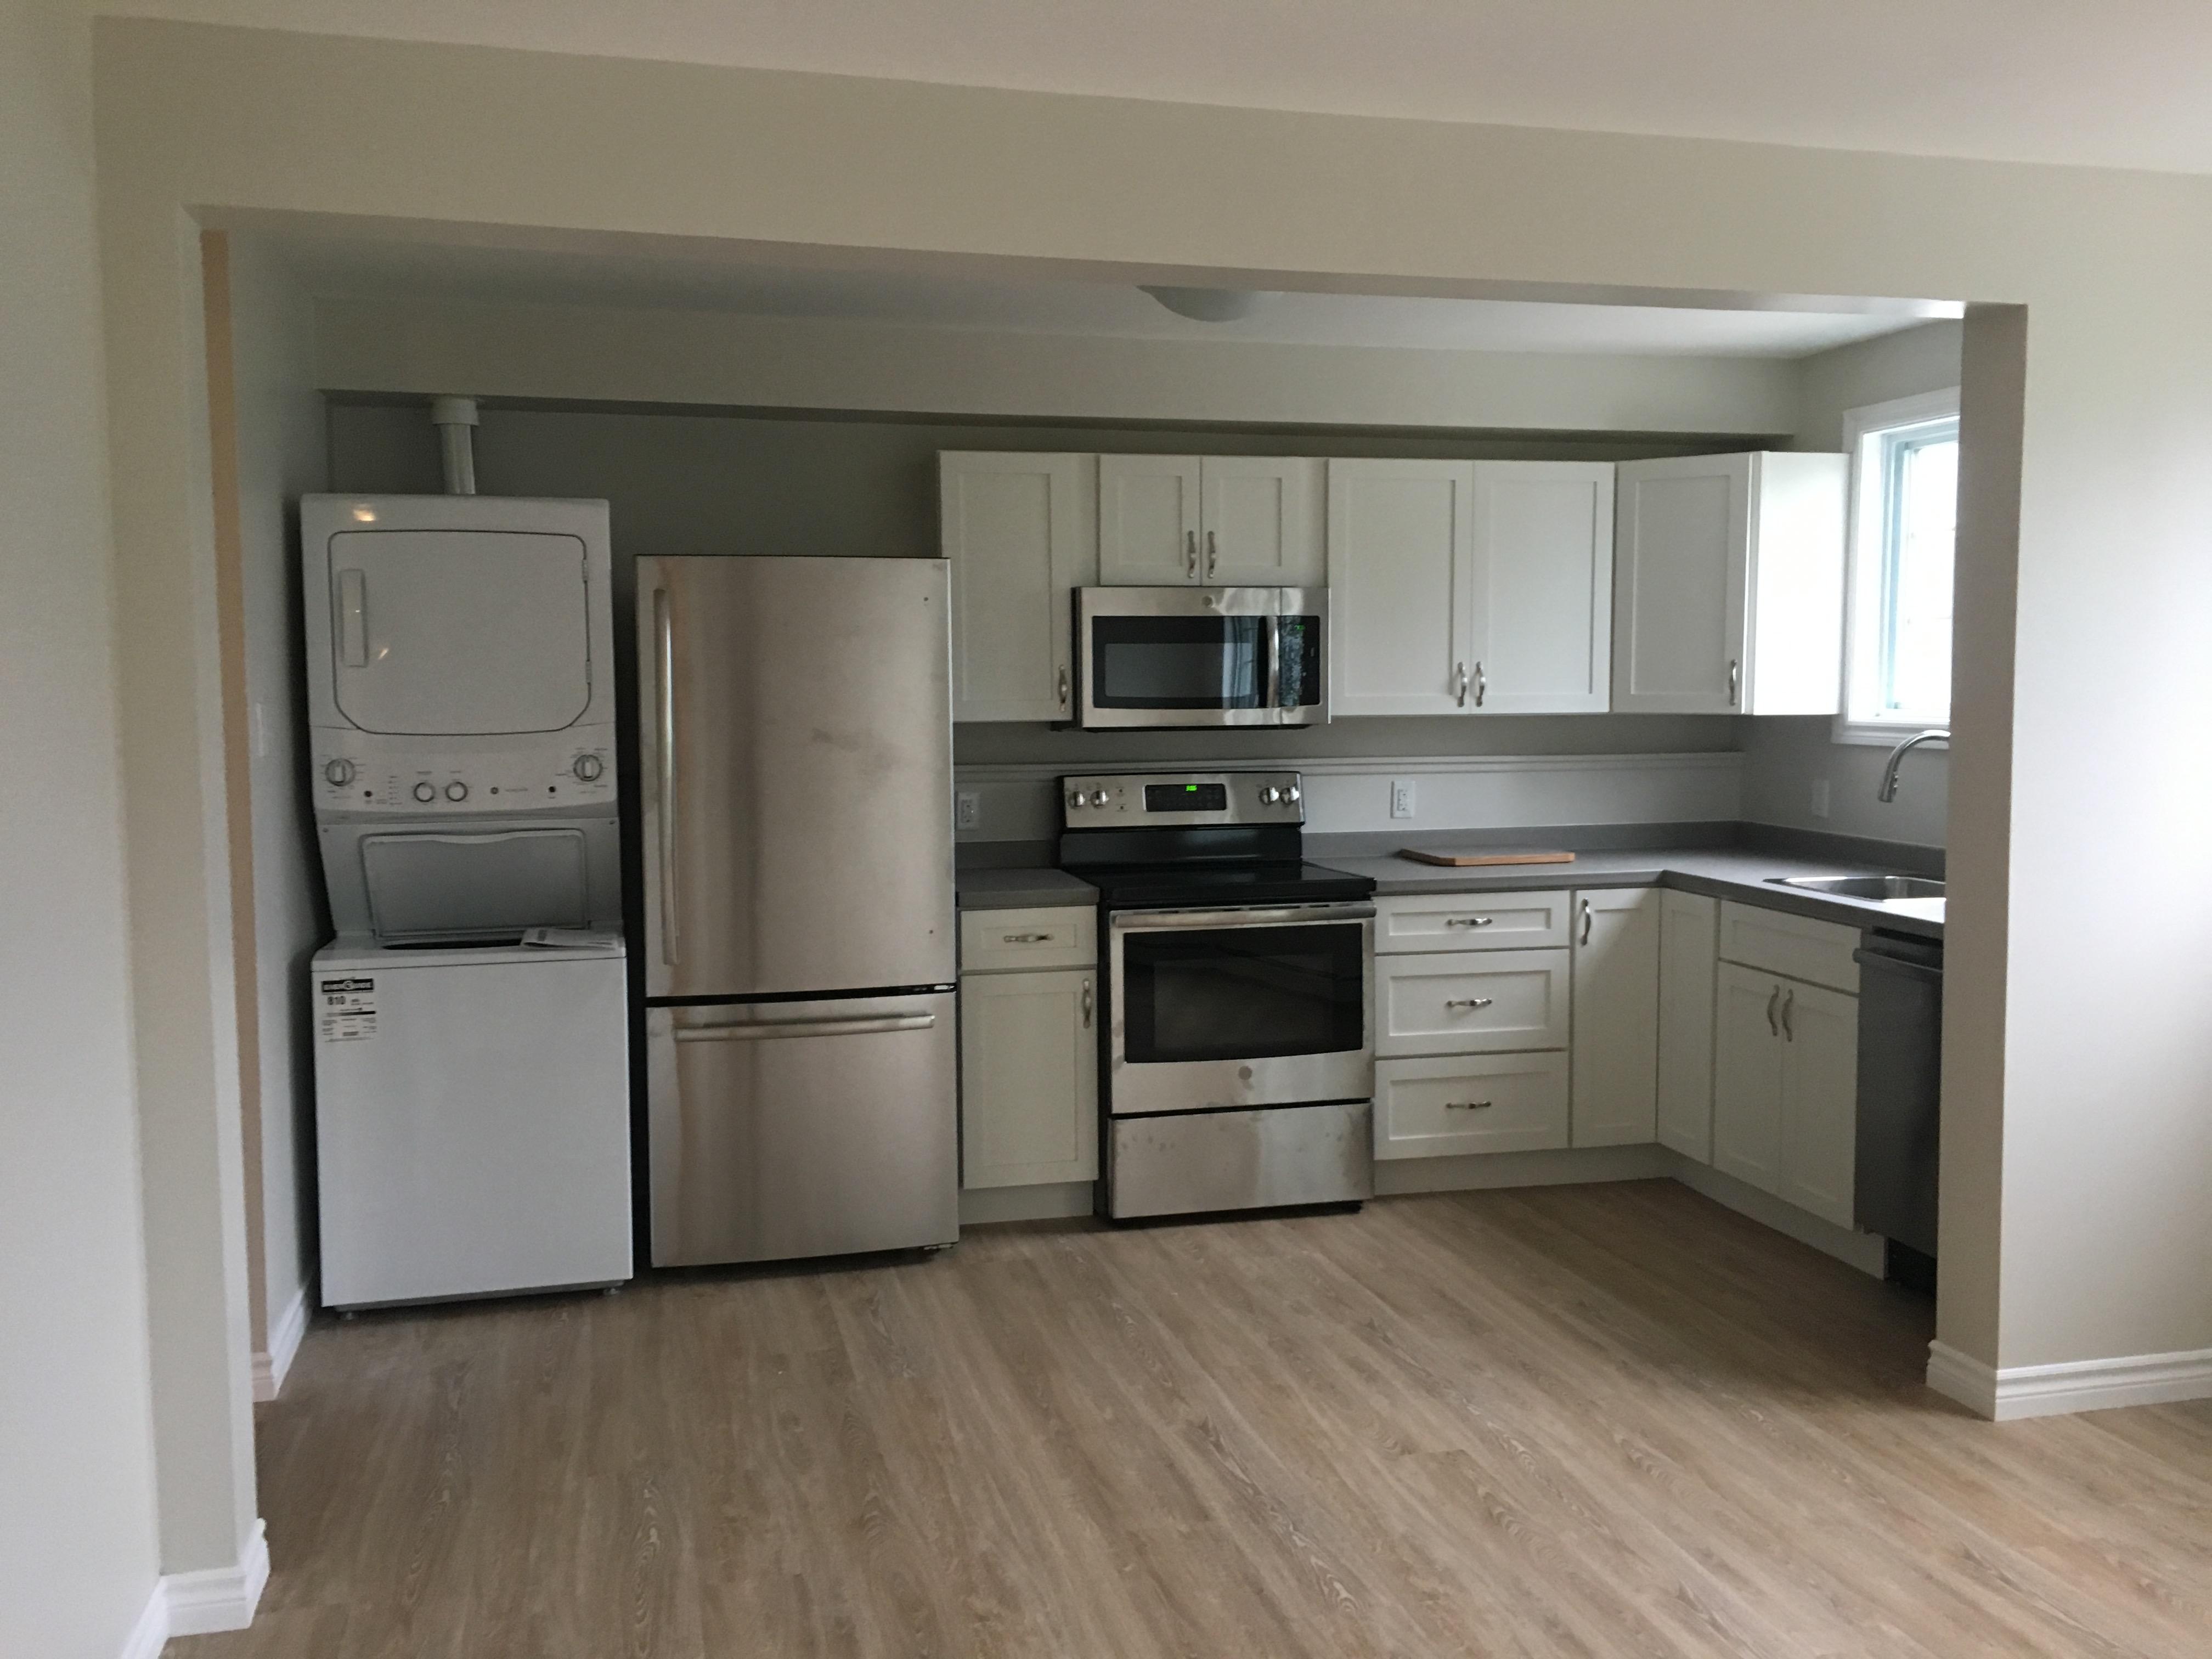 3251 Agricola Street  Three Bedroom Unit 4 – Available September 1st